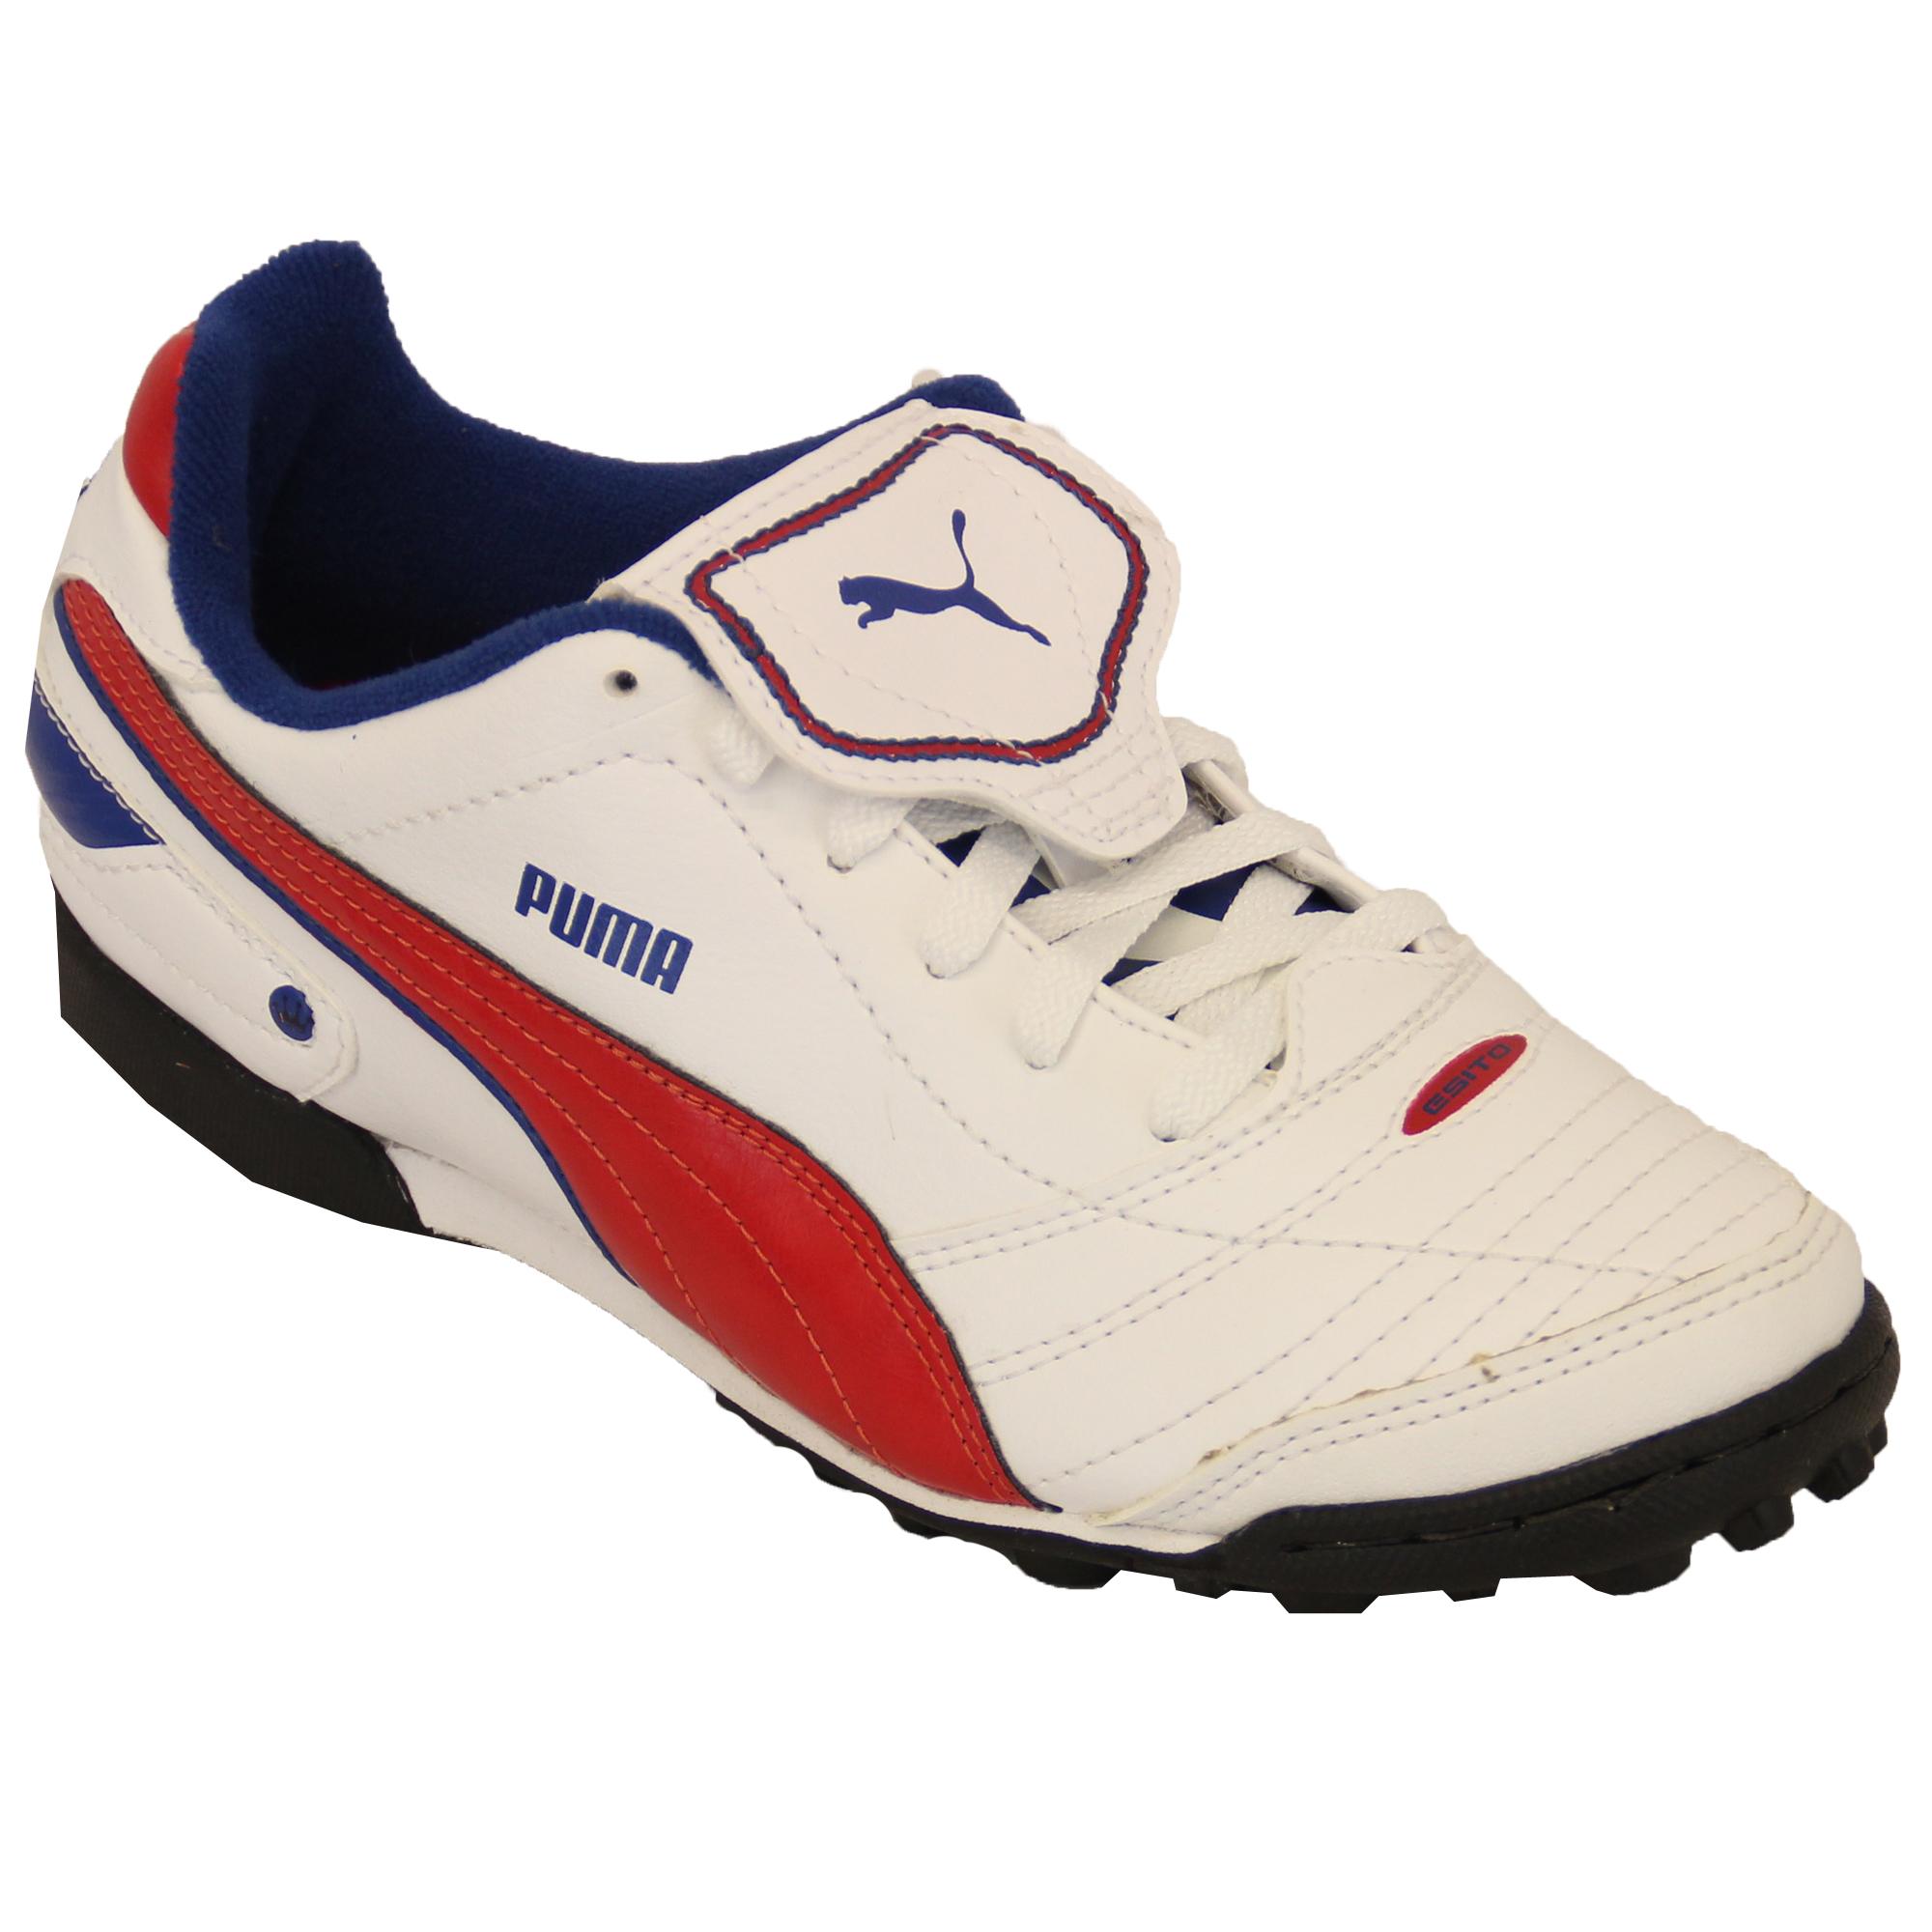 Boys Football Trainers Puma Kids Boots Shoes Astro Turf ...